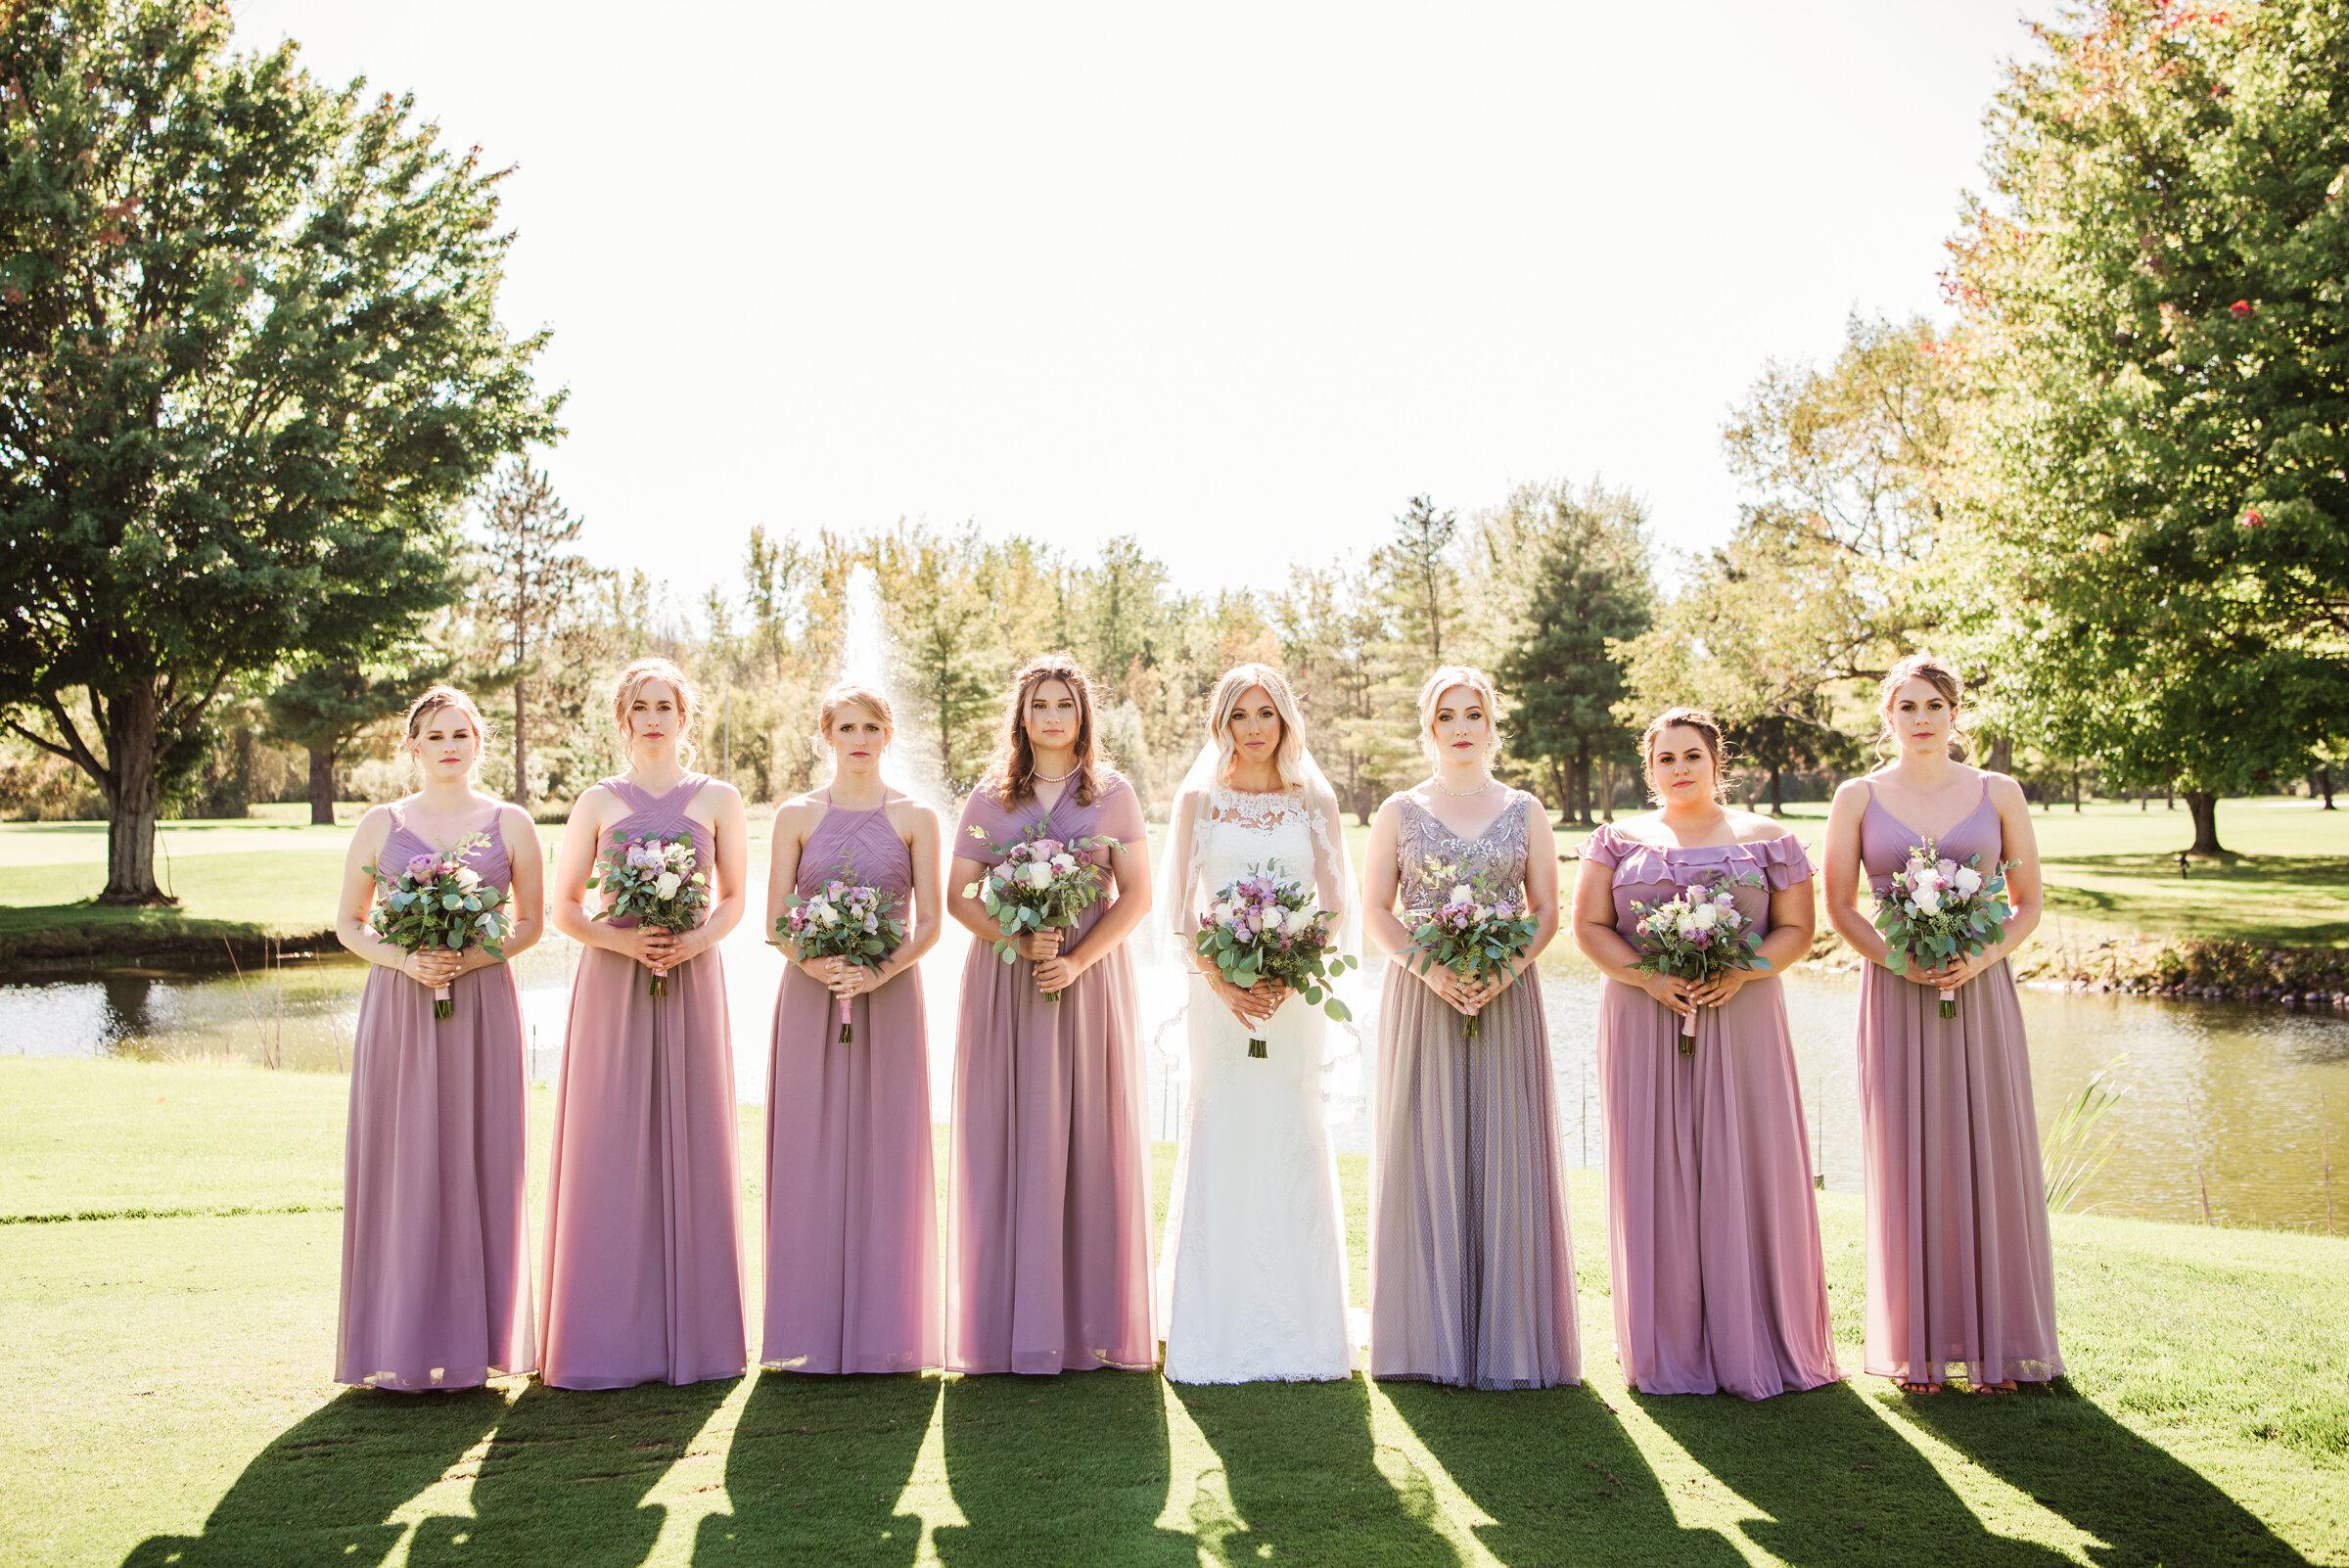 Deerfield_Country_Club_Rochester_Wedding_JILL_STUDIO_Rochester_NY_Photographer_DSC_6249.jpg